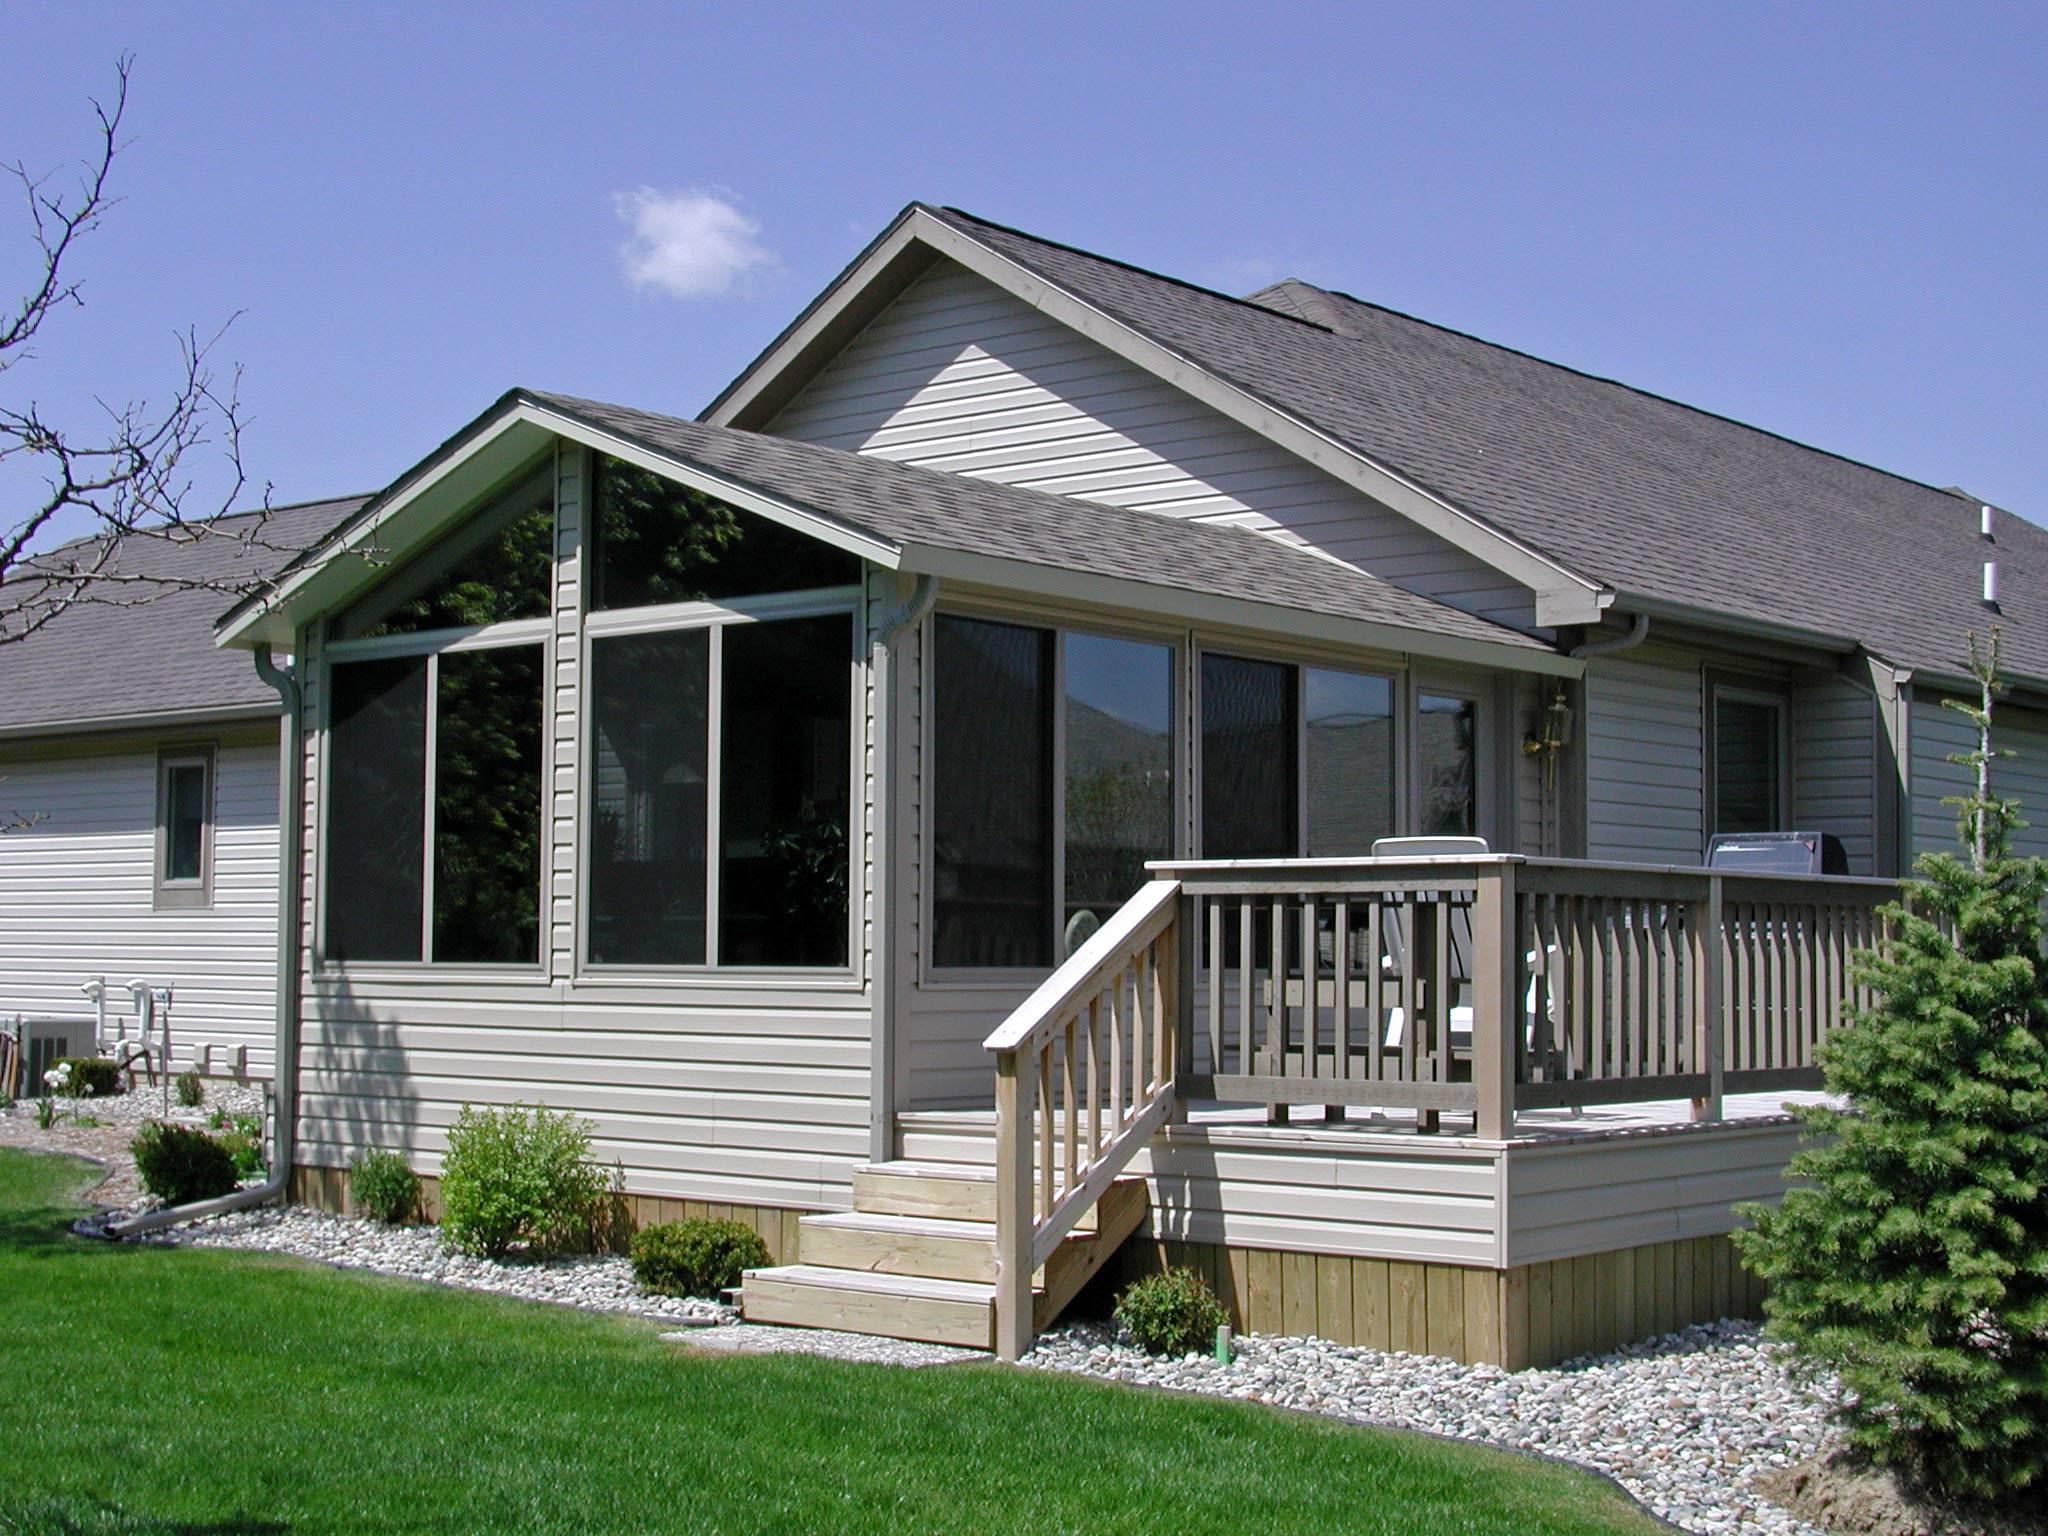 Double Gable Roof Design Sunroom Vinyl House Plans 84409